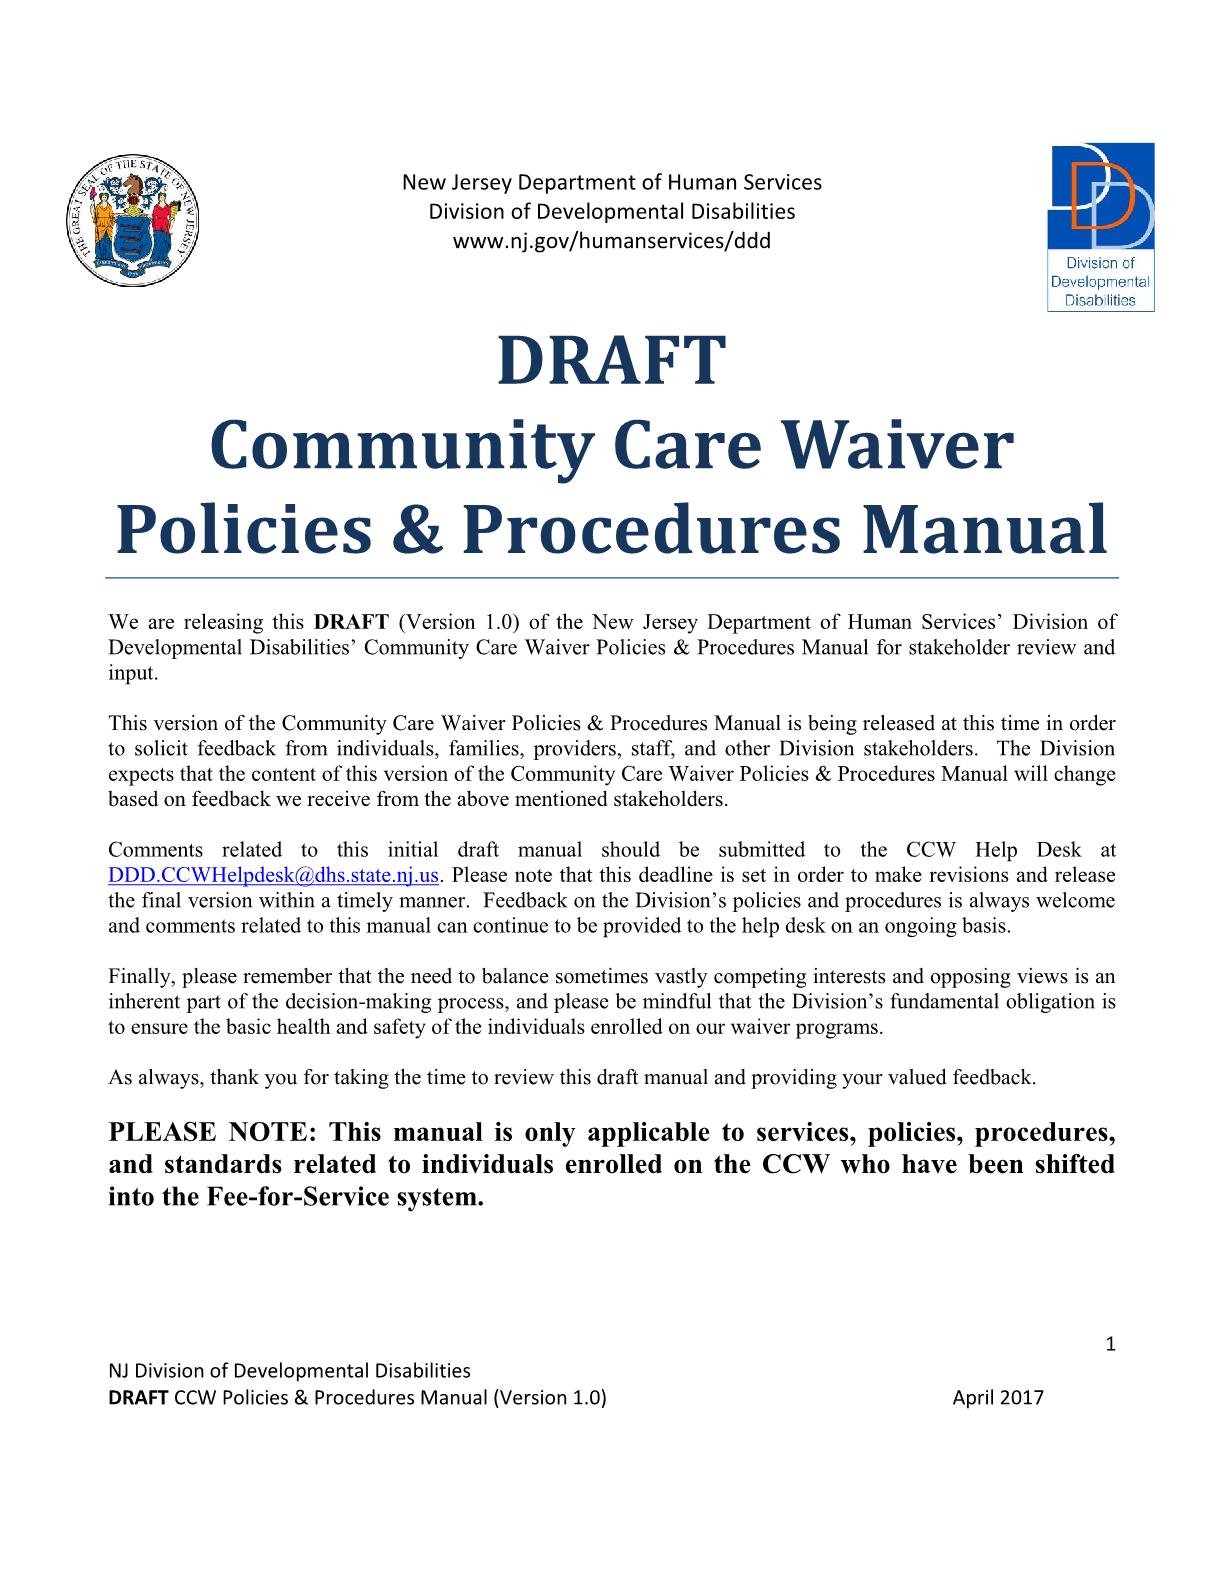 Community Care Program Policies & Procedures Manual